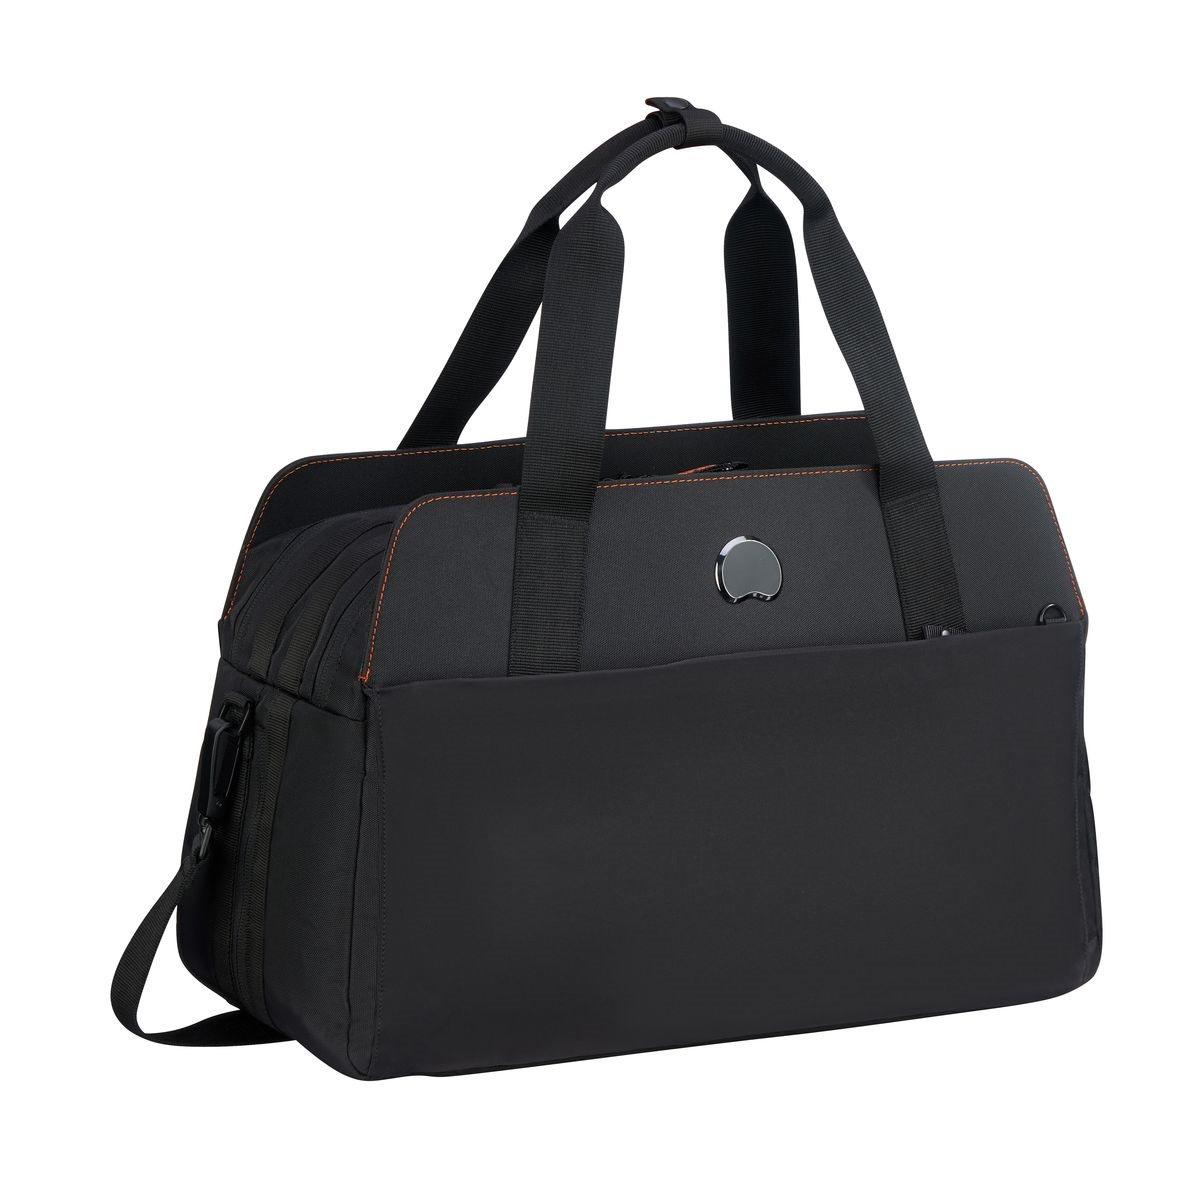 Delsey Τσάντα ταξιδίου 29x46,5x20,5/24,5cm με θέση για PC 14'' σειρά Daily s Orange Black